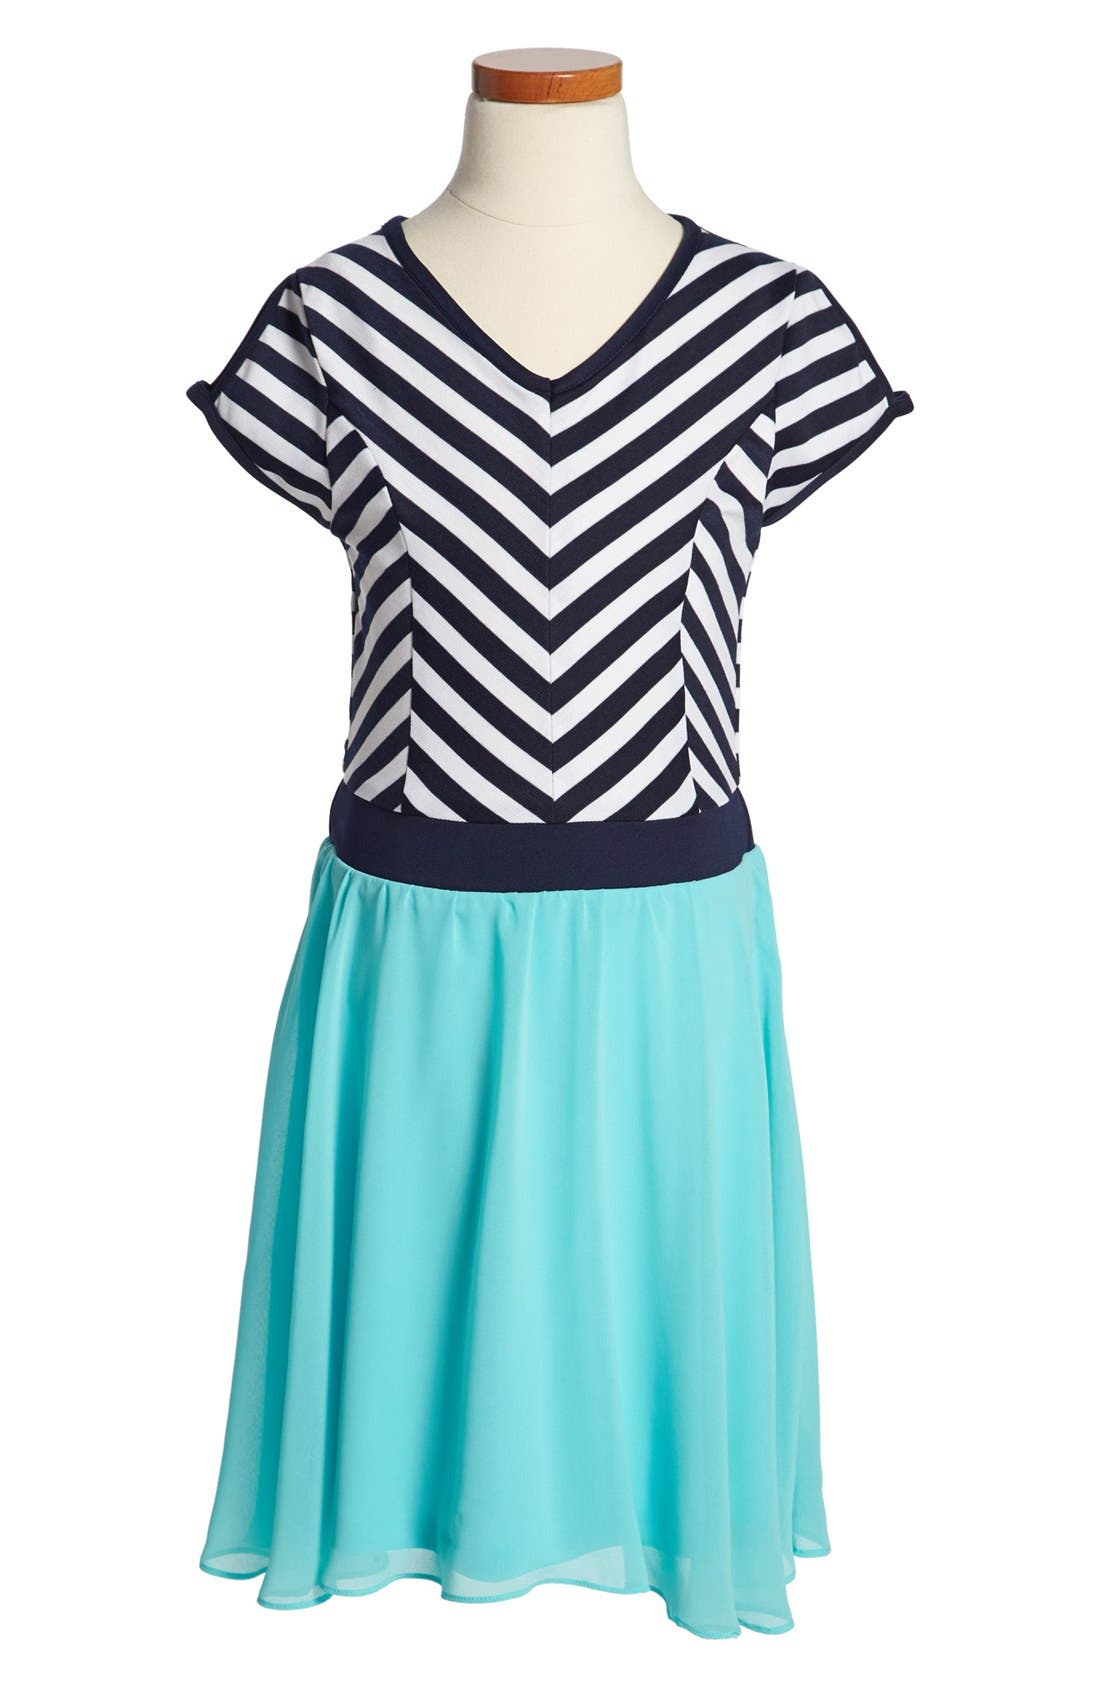 Alternate Image 1 Selected - Sally Miller 'Alexi' Dress (Big Girls)